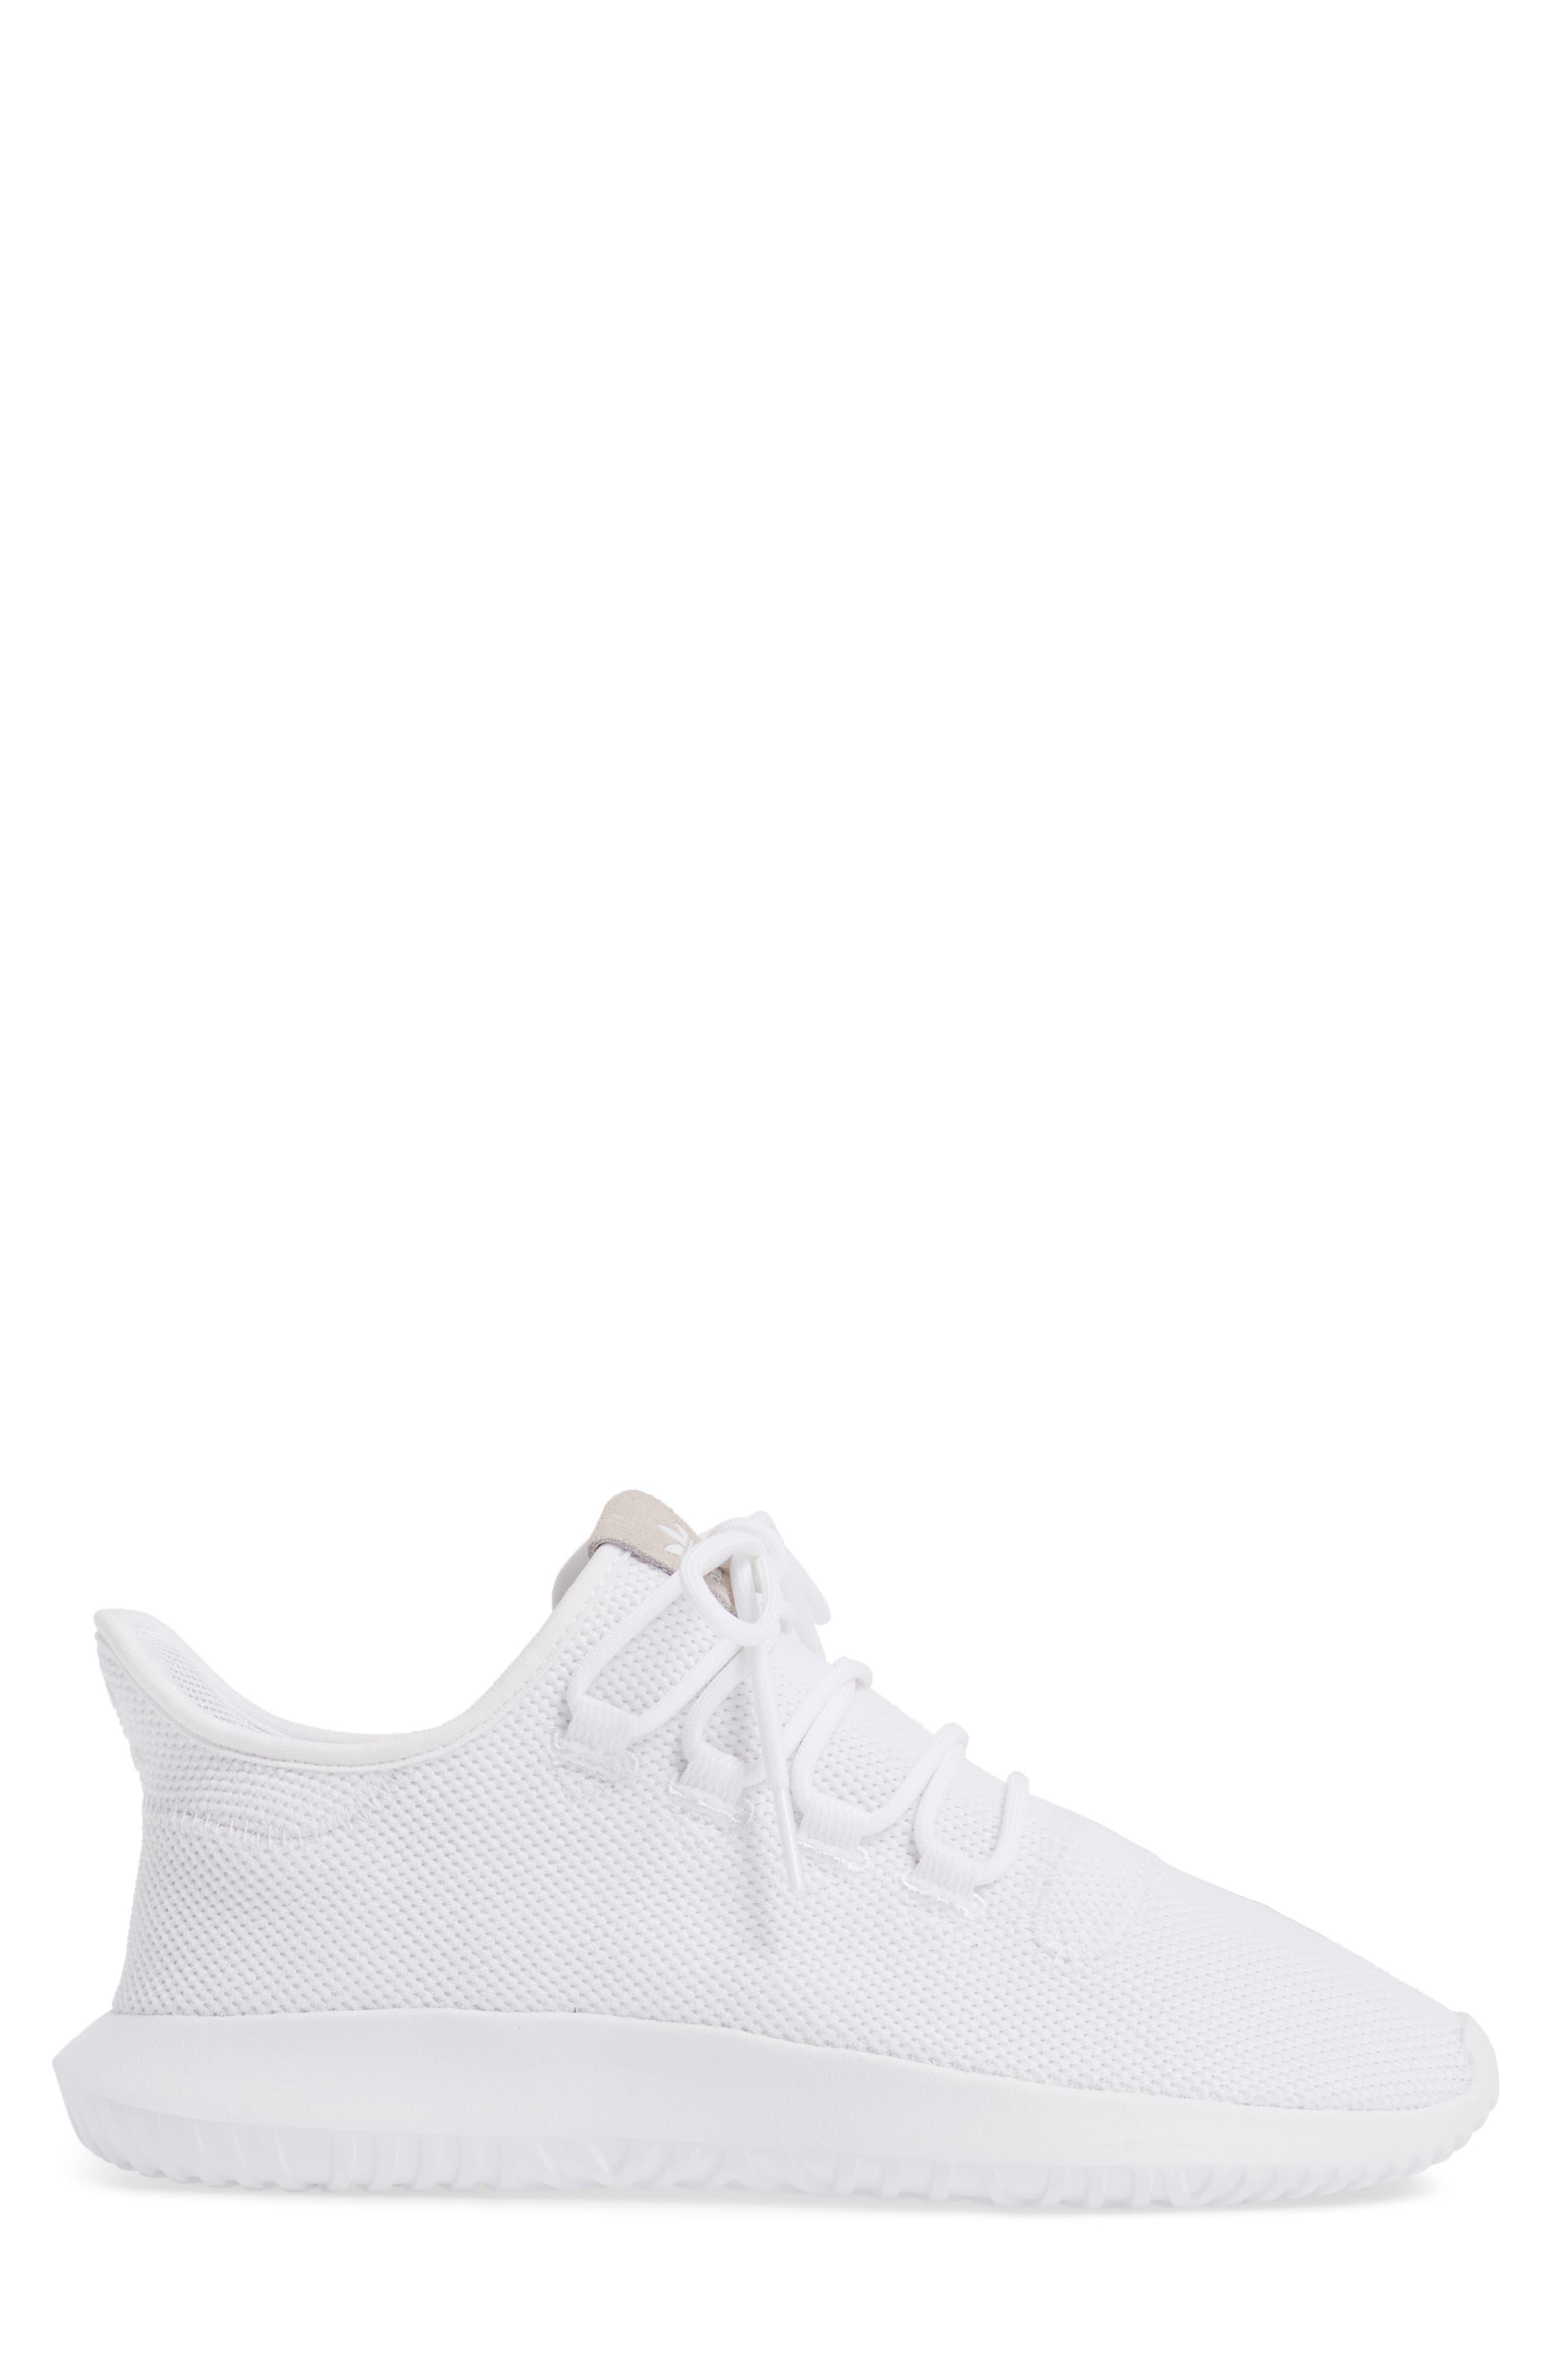 Tubular Shadow Sneaker,                             Alternate thumbnail 3, color,                             White/ Core Black/ White